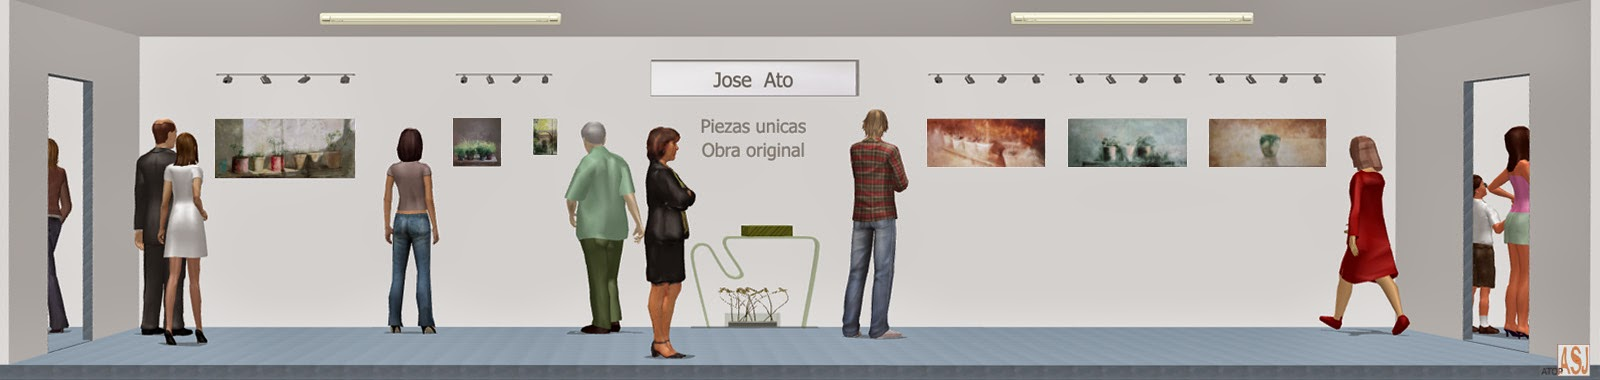 "<img src="" http://1.bp.blogspot.com/-H4fObkxJUnc/U8BjYgtGg-I/AAAAAAAAaeA/PTa_dMi9lFI/s1600/jose-ato.jpg "" alt=""sala de exposición virtual de pinturas de José Ato""/>"